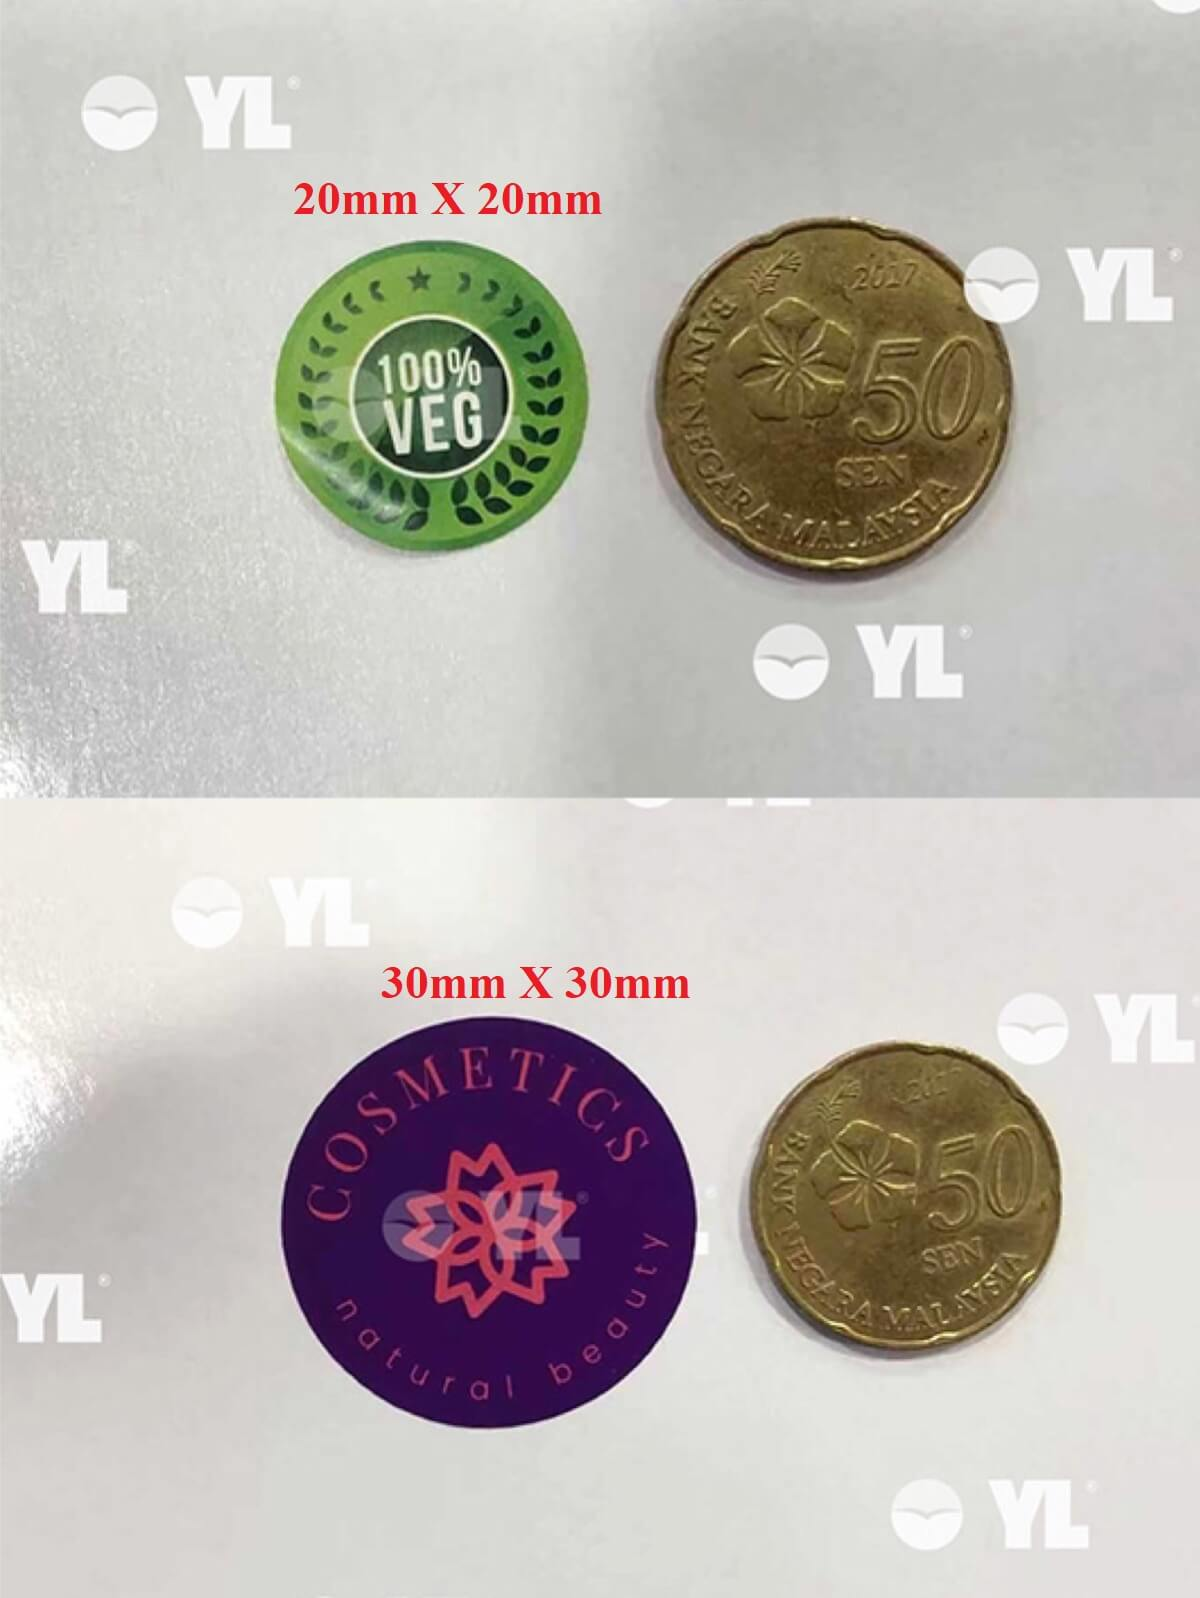 https://www.yl.com.my:449/admin/uploads/products/3cc0113c-8f72-4e7e-ae53-50d2e10047b1/20mm-30mm_3281.jpg